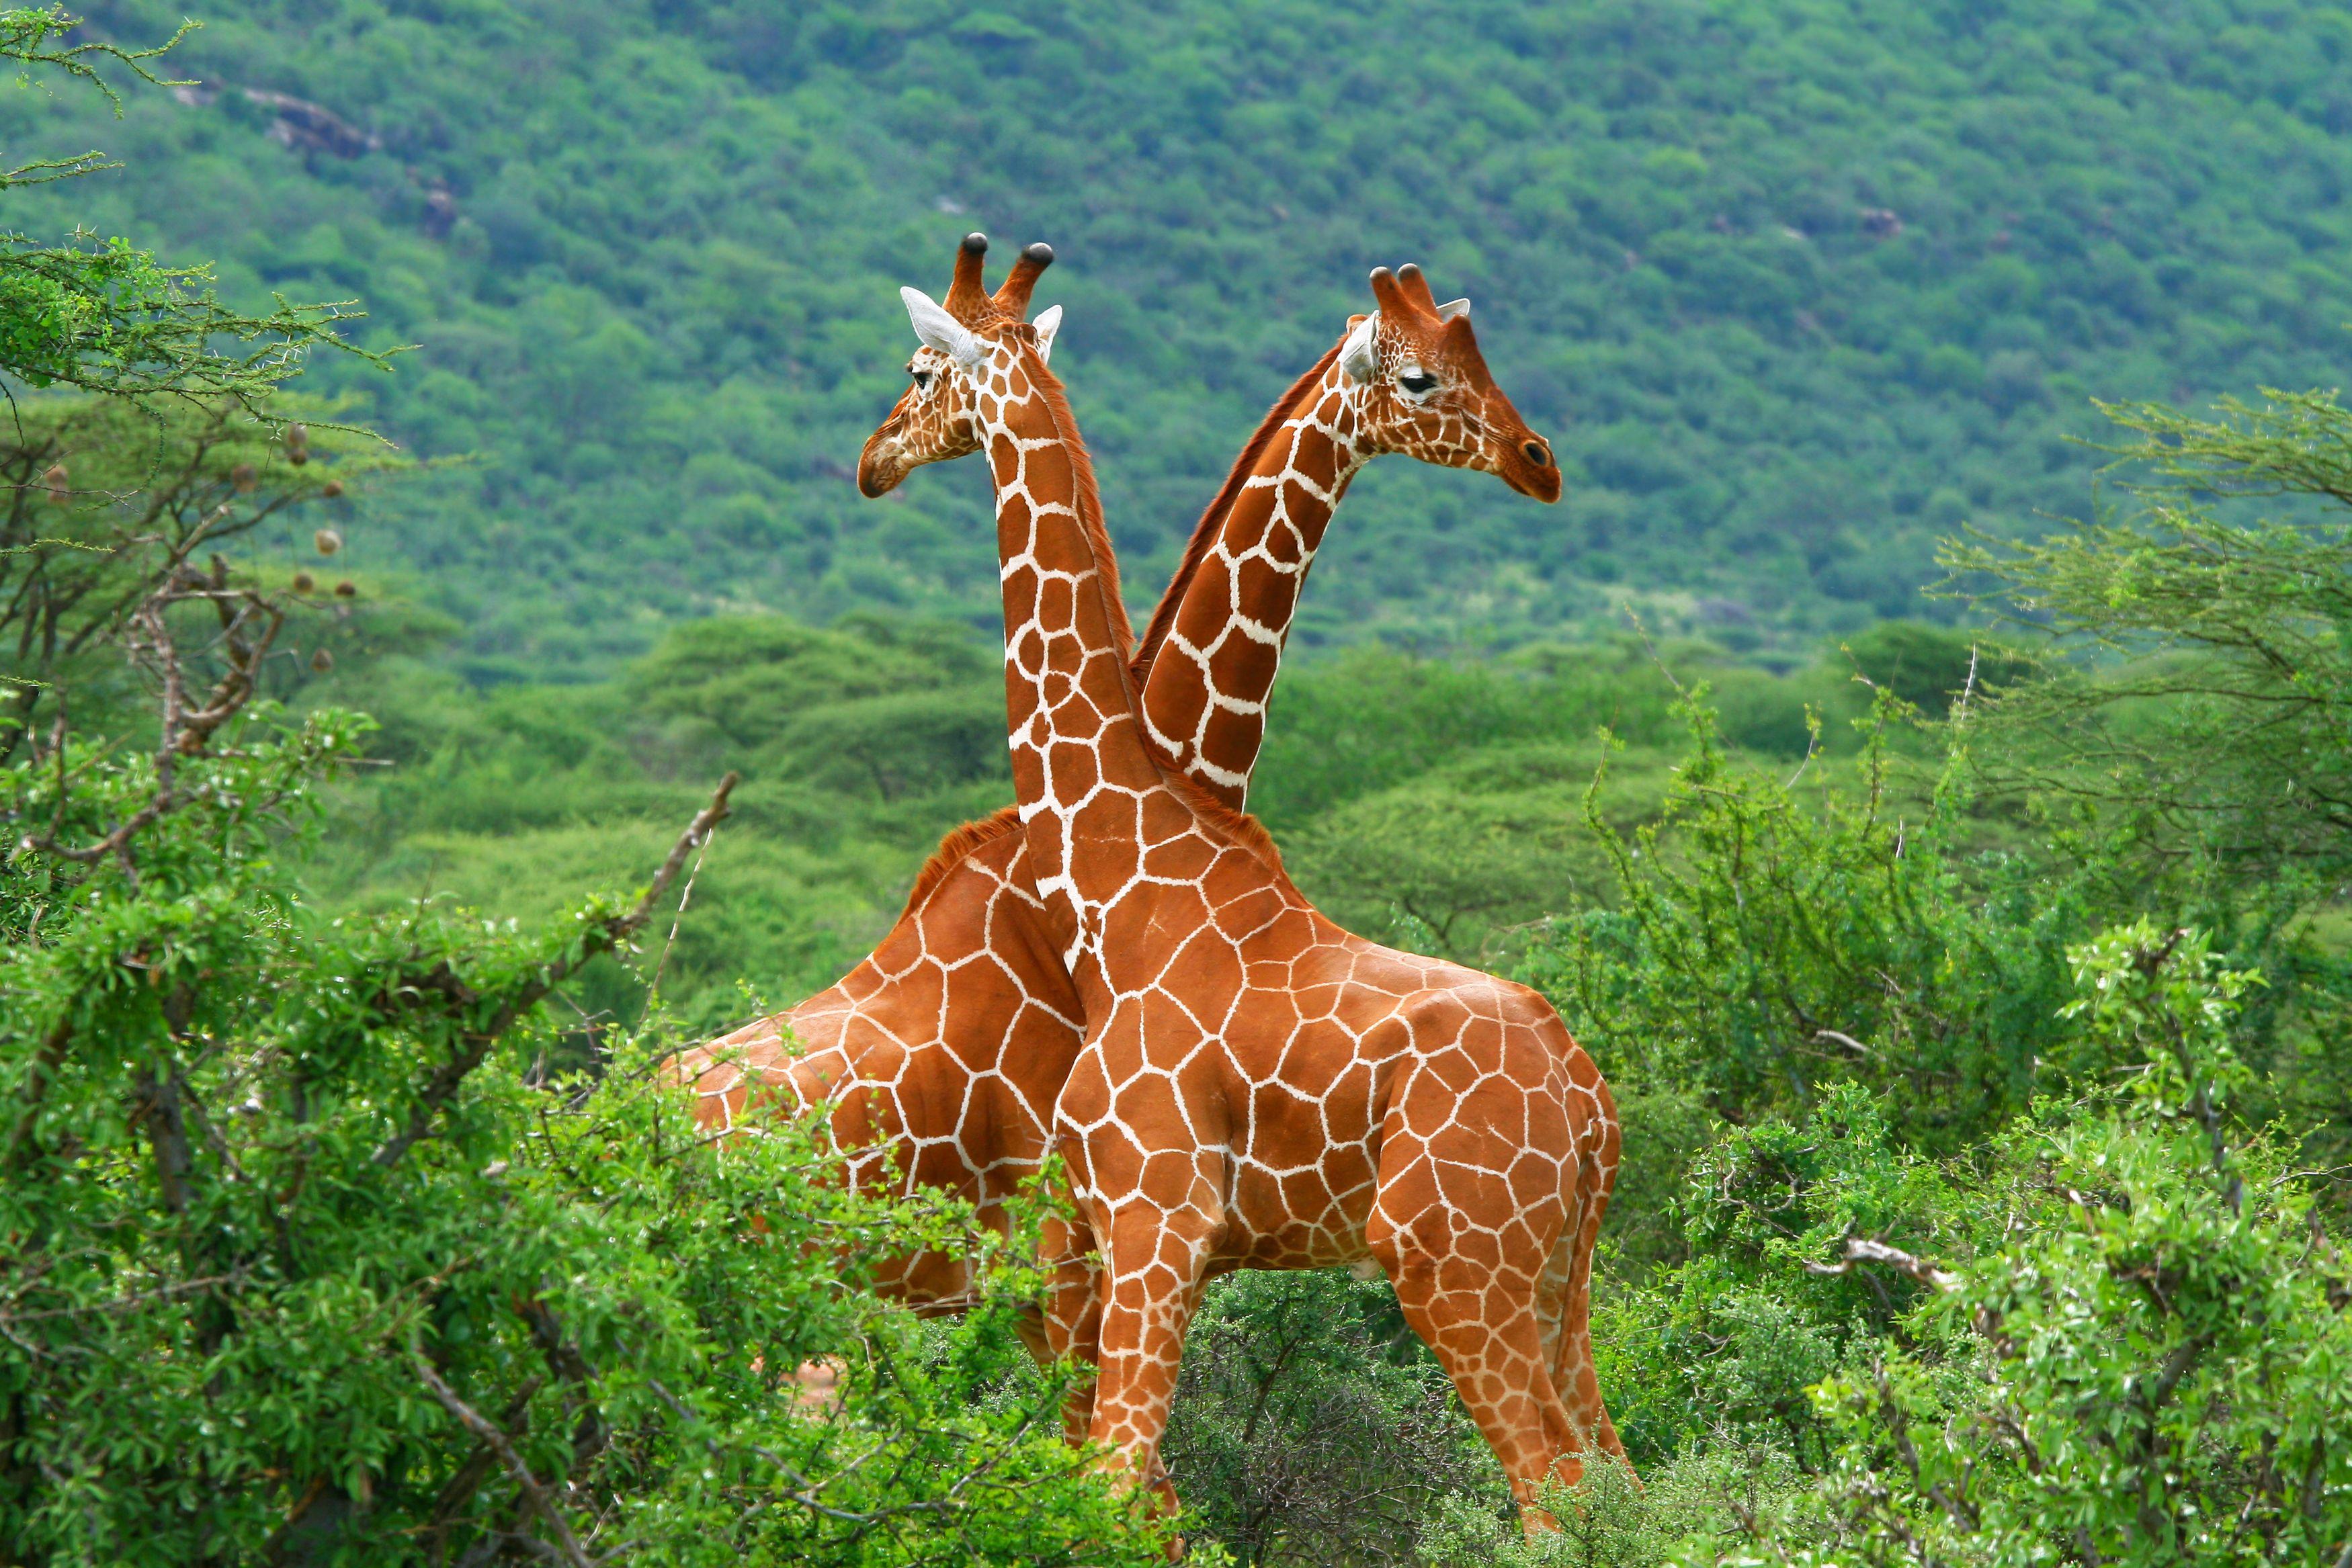 Professionalphotographyinkenya Photographyservicesinkenya Photographyinkenya Photography Is In Our Dna At Conquest Nature Animals Animals Wild Giraffe